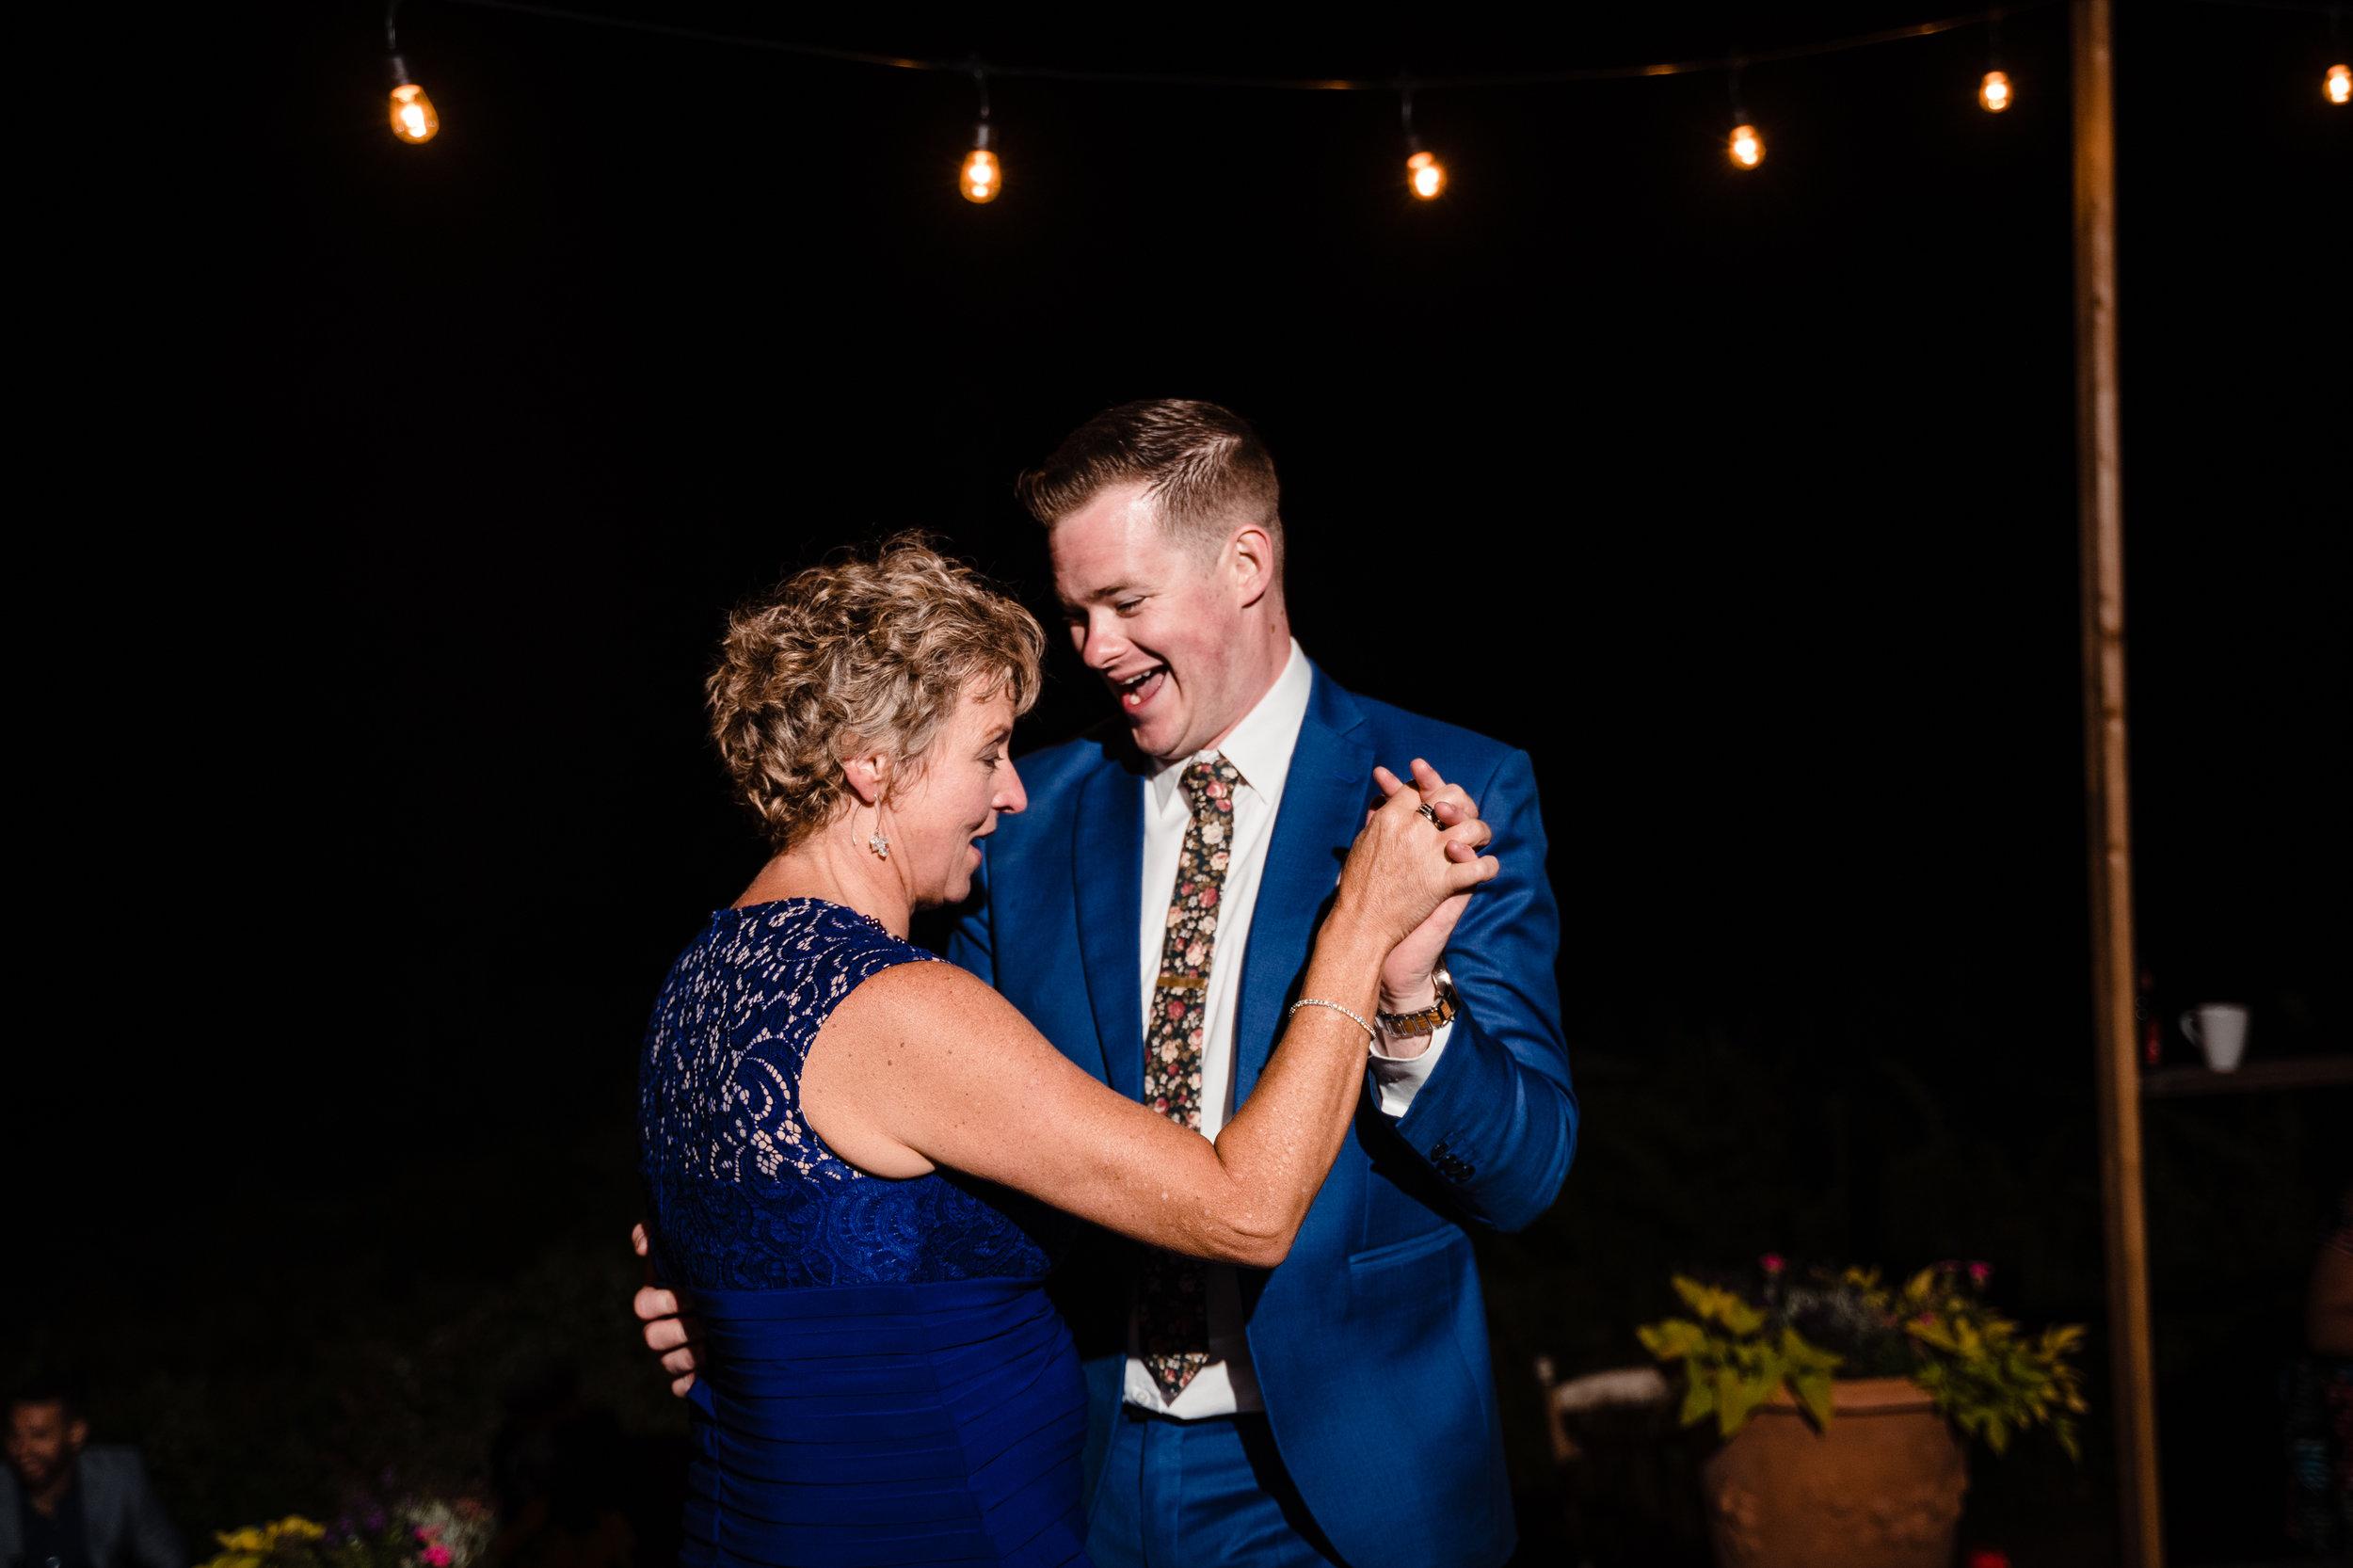 Janelle-Mitch-Halifax-Wedding-Nova-Scotia-Photography (148 of 163).jpg